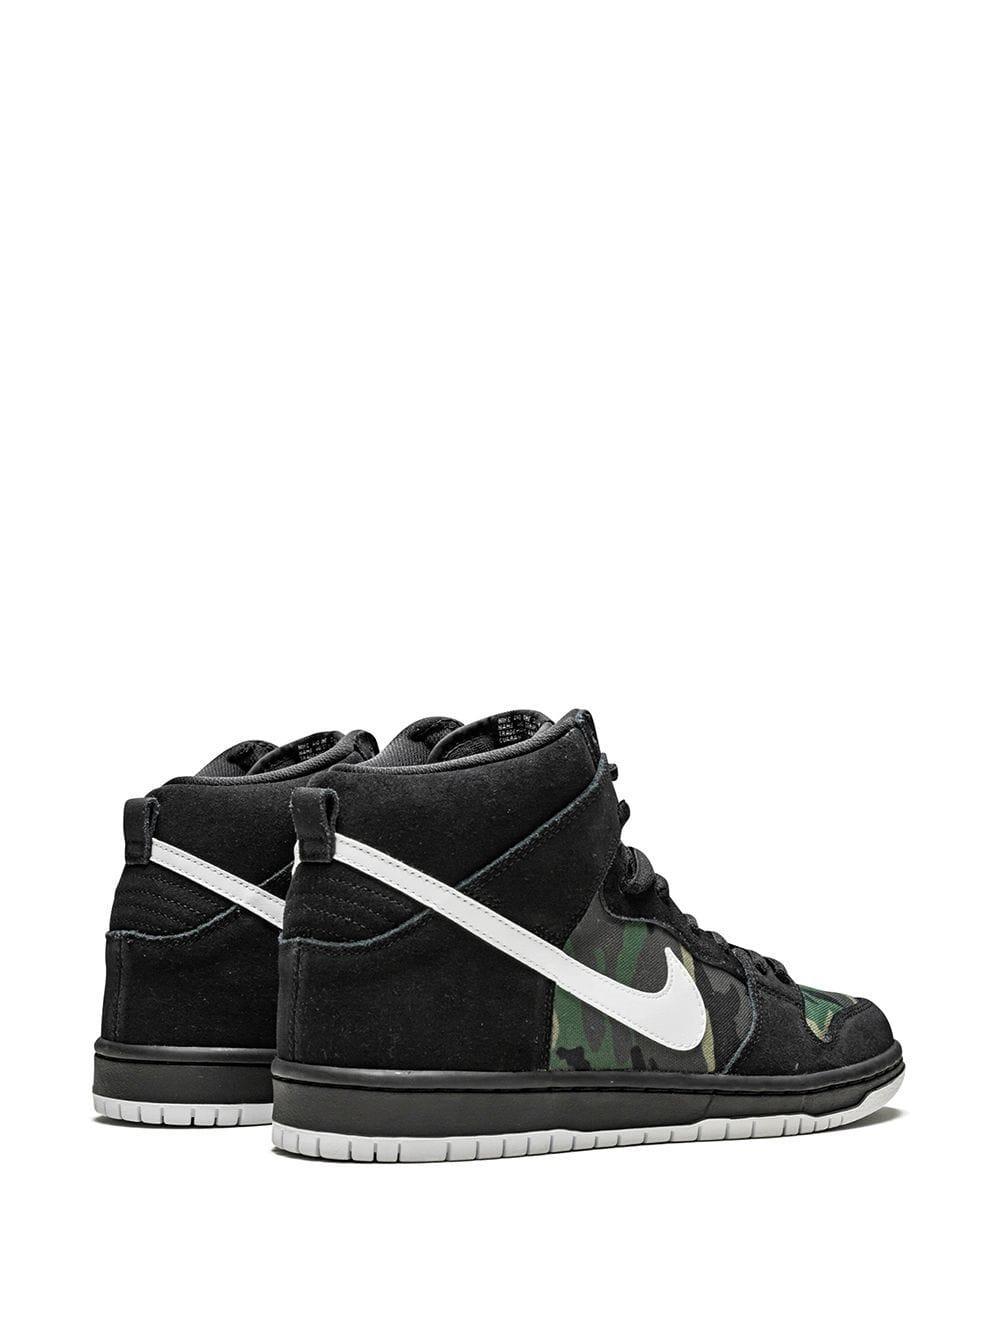 Zapatillas SB Dunk High Pro Nike